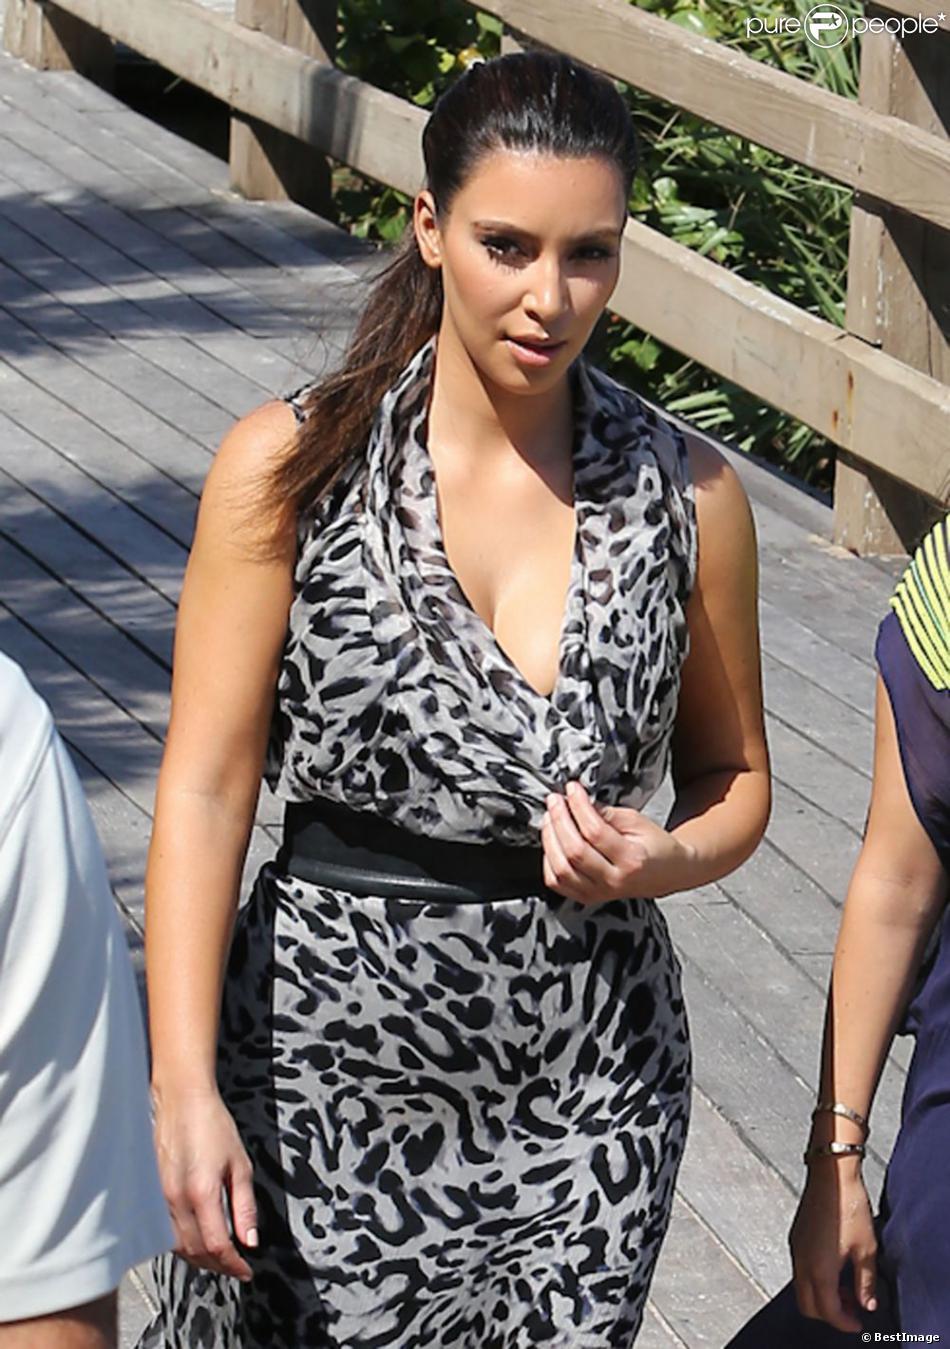 kim kardashian ravissante et en balade sur la plage miami le 3 octobre 2012. Black Bedroom Furniture Sets. Home Design Ideas